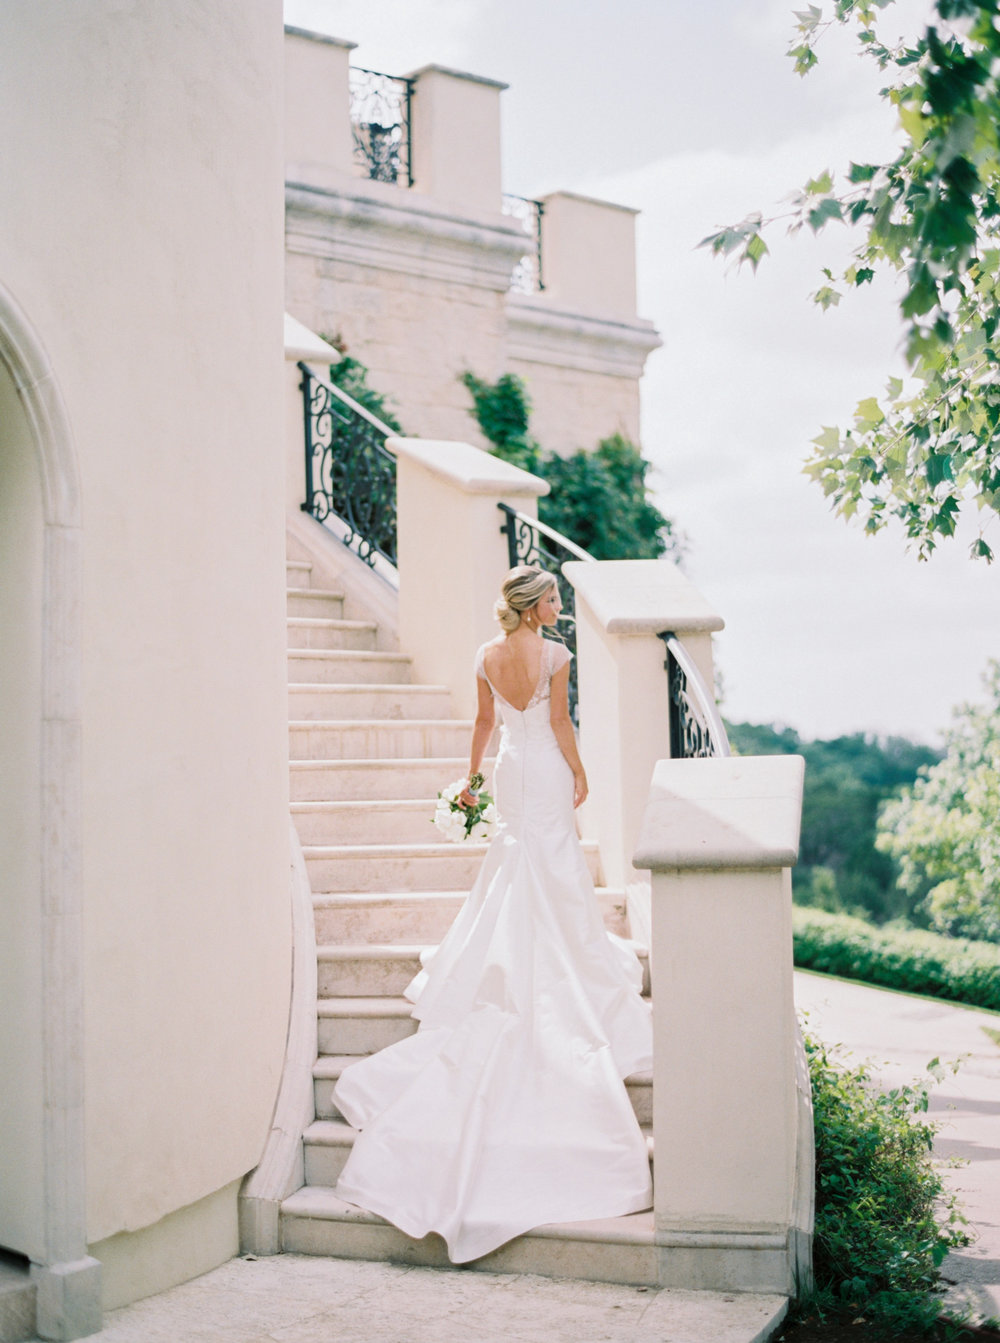 jenna-mcelroy-bridal-portraits-a-southern-tradition-1